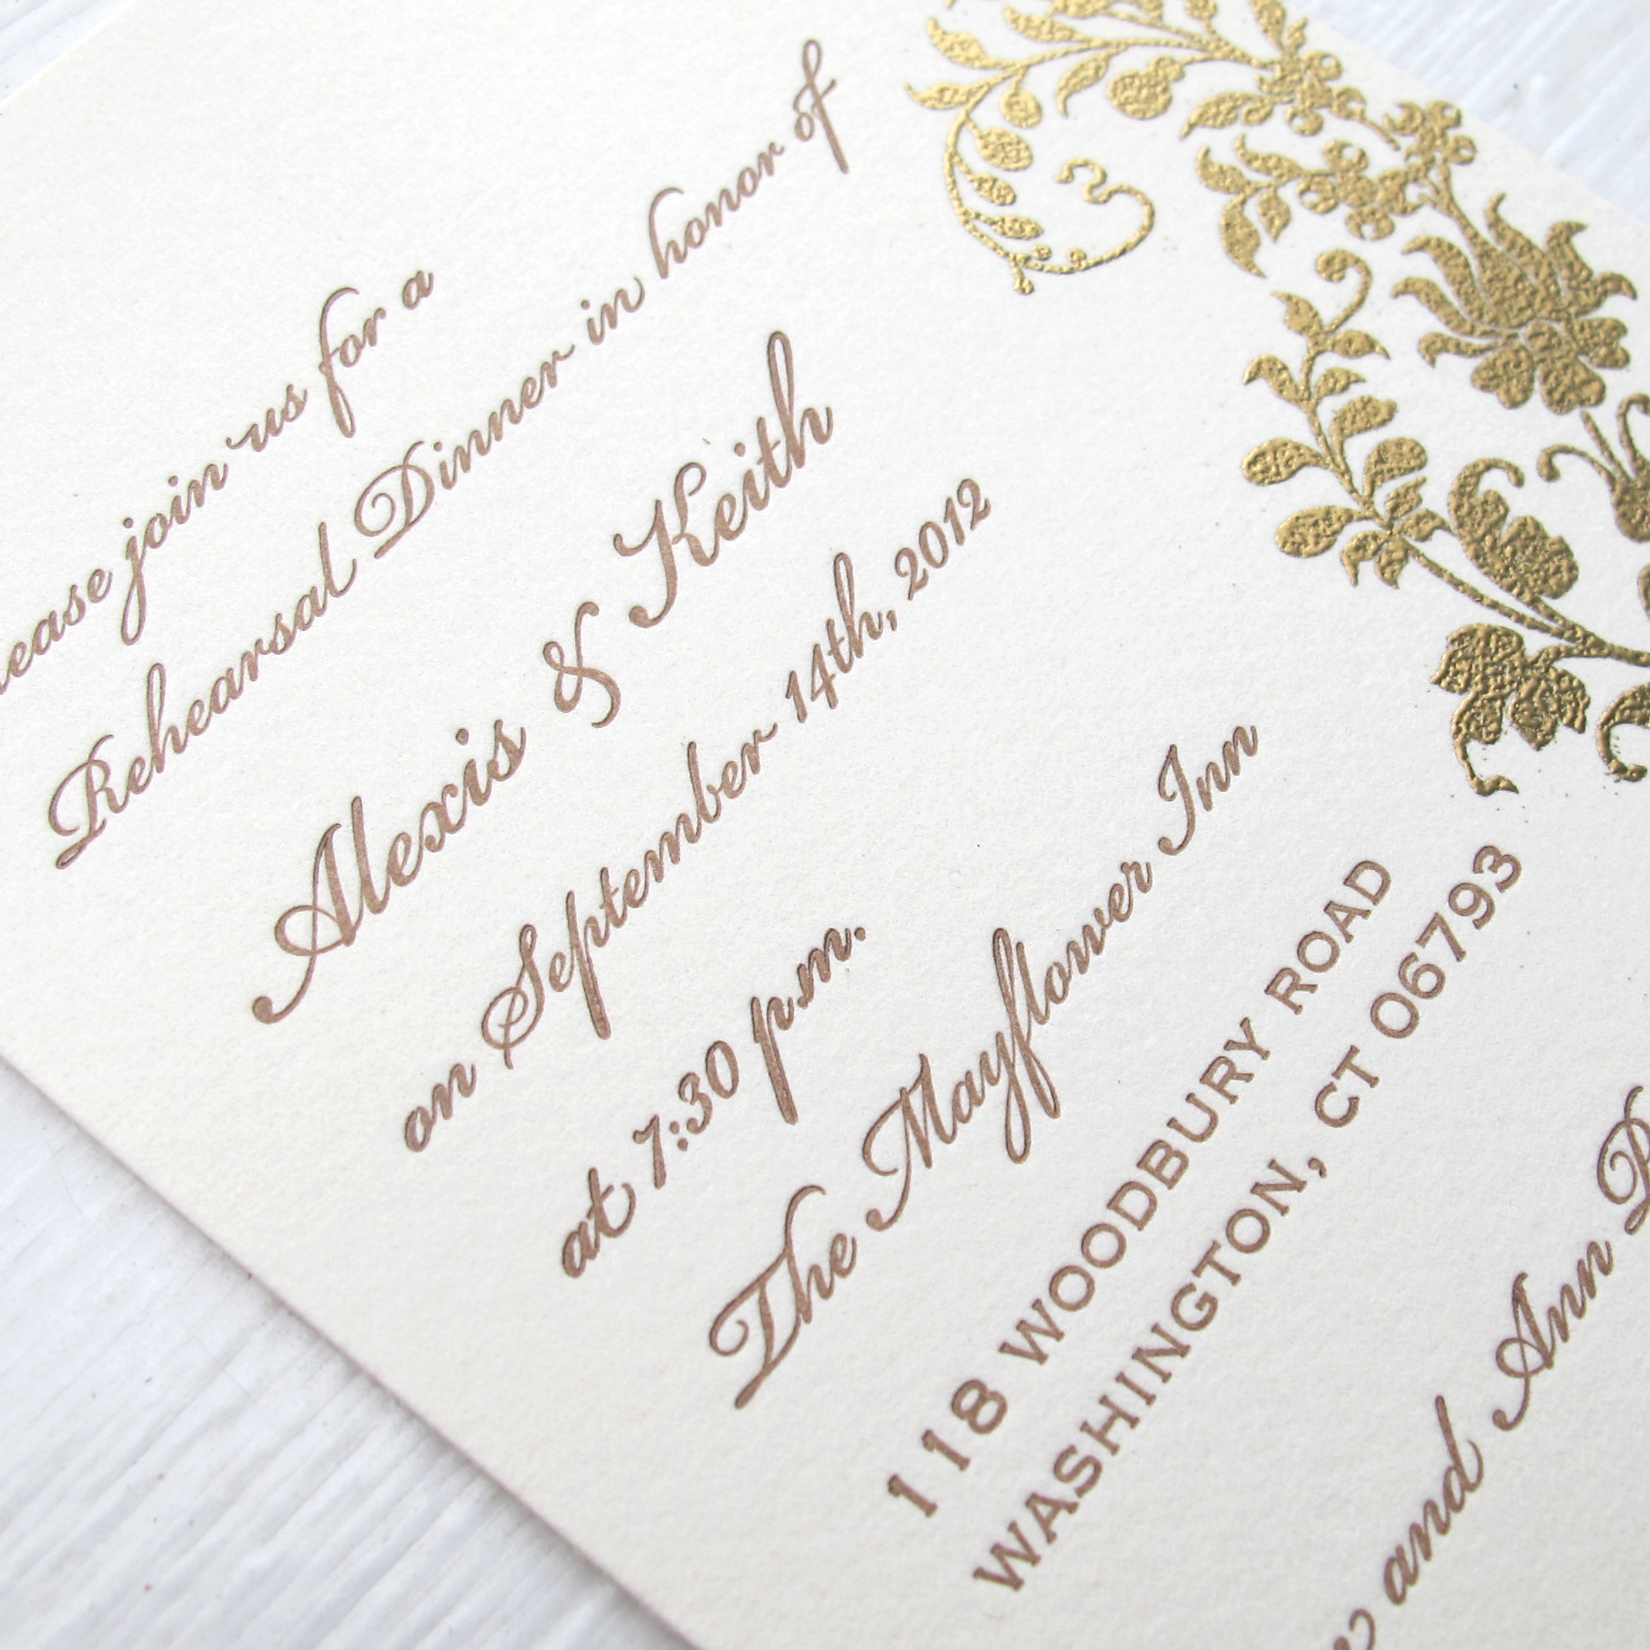 invite_gold vine_3.jpg